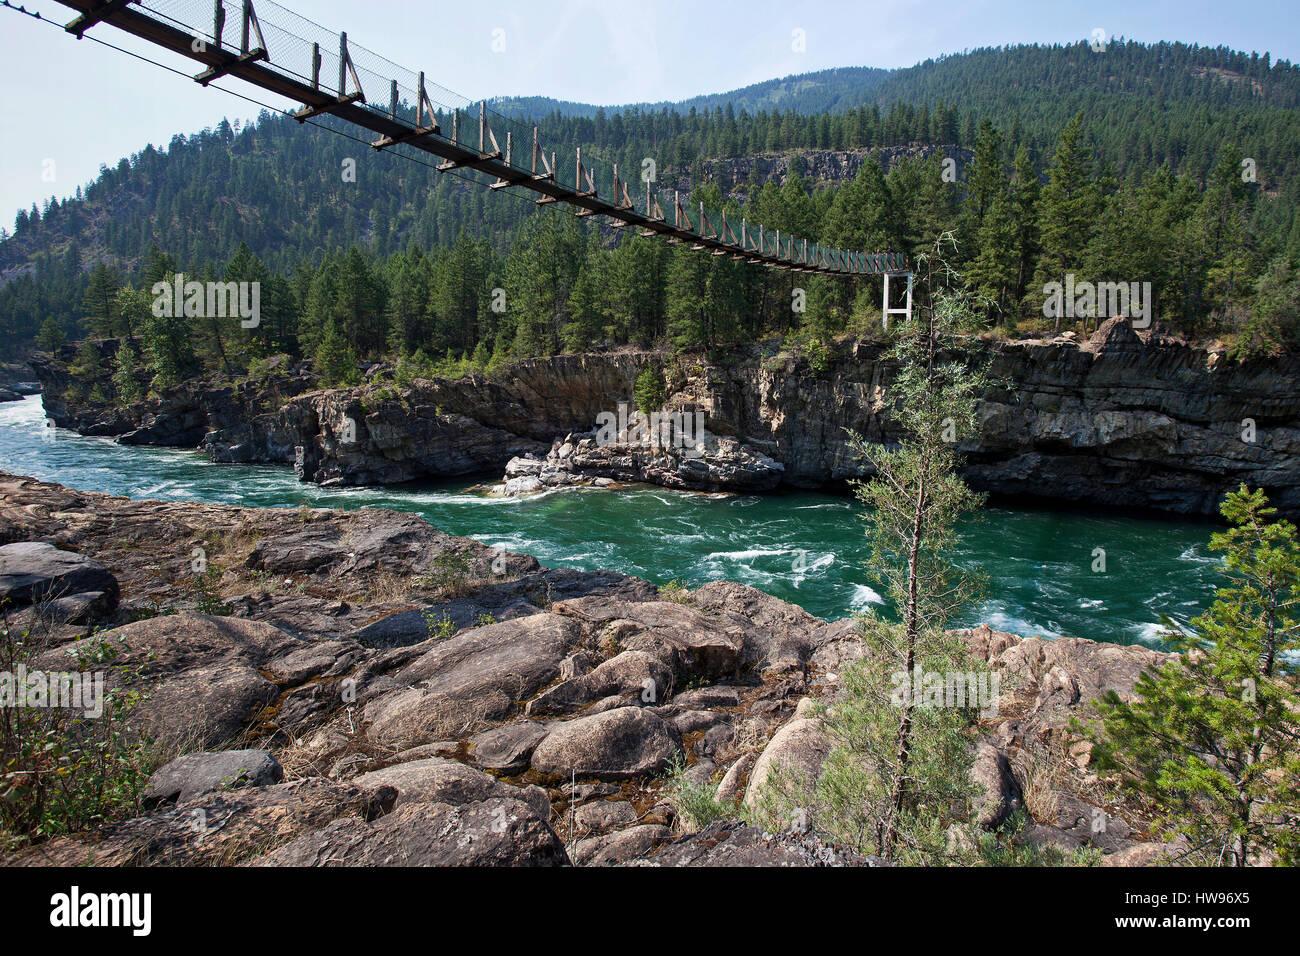 Suspension bridge over the Kootenay River near Libby, Montana Province, USA - Stock Image